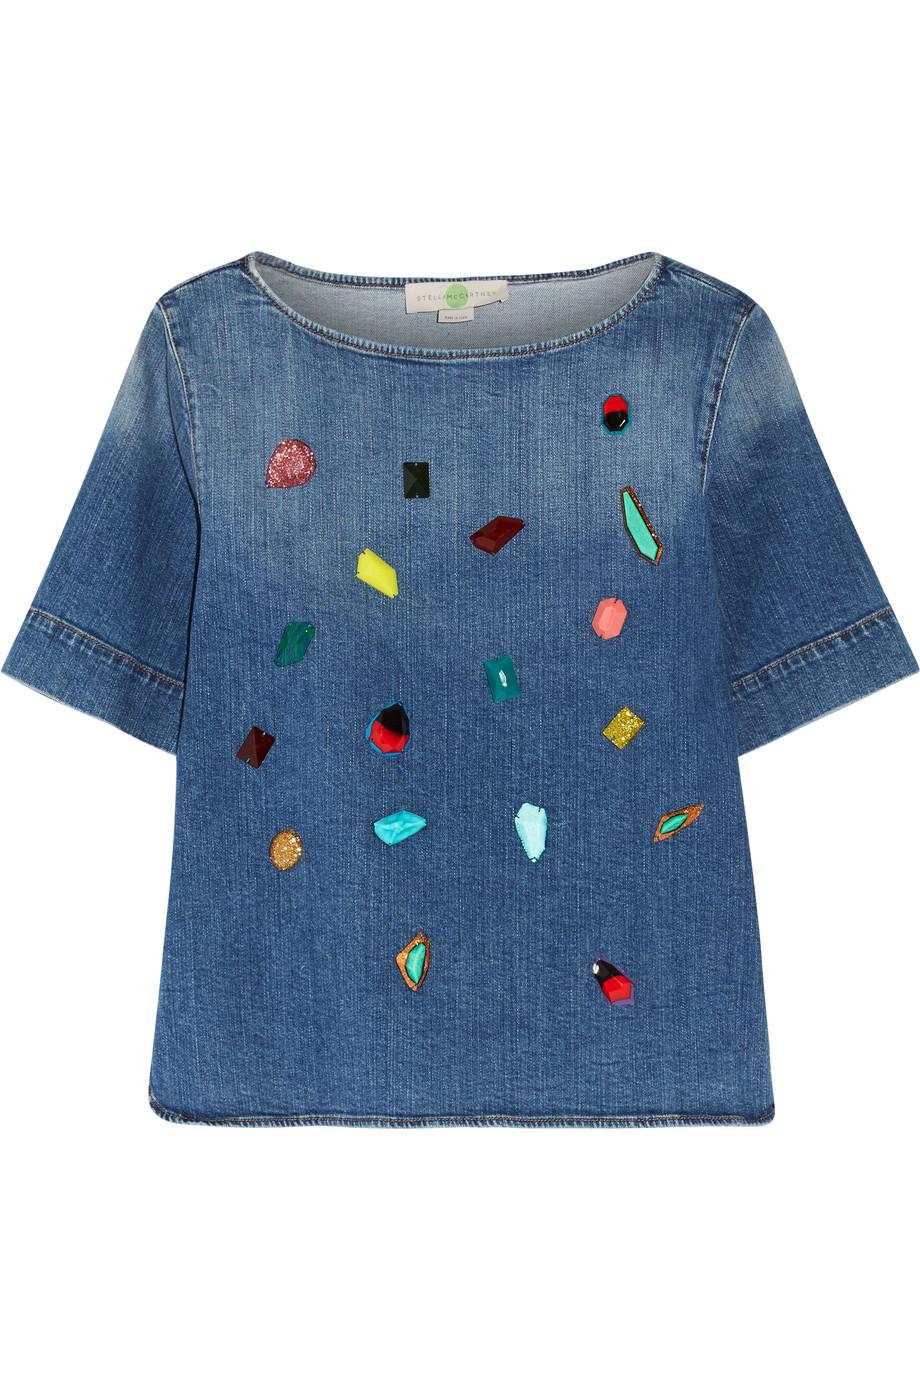 Stella McCartney / Stone-embellished stretch denim top